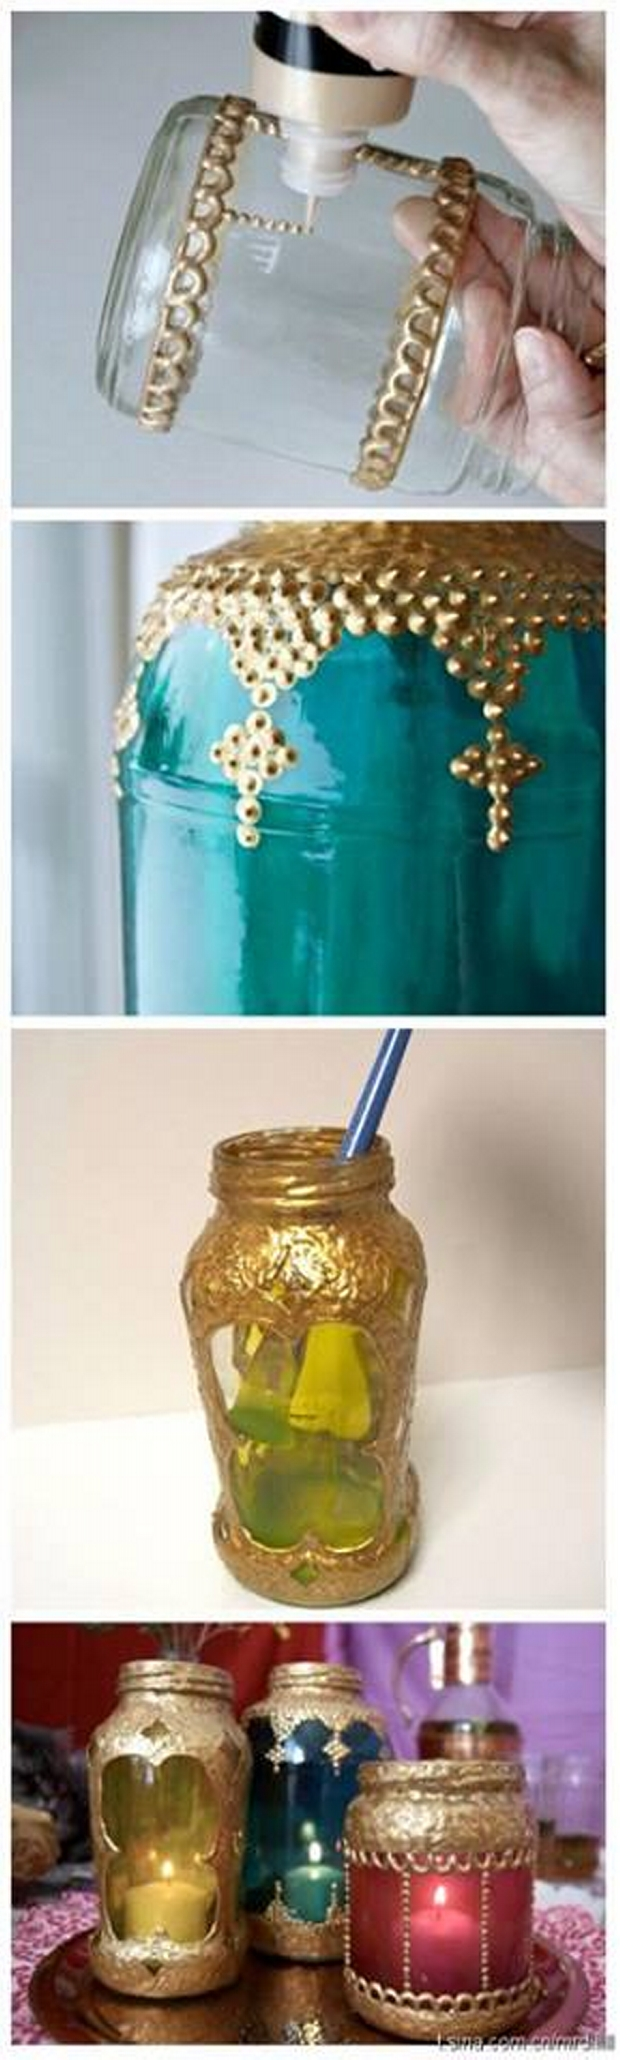 Mason Jars Recycled